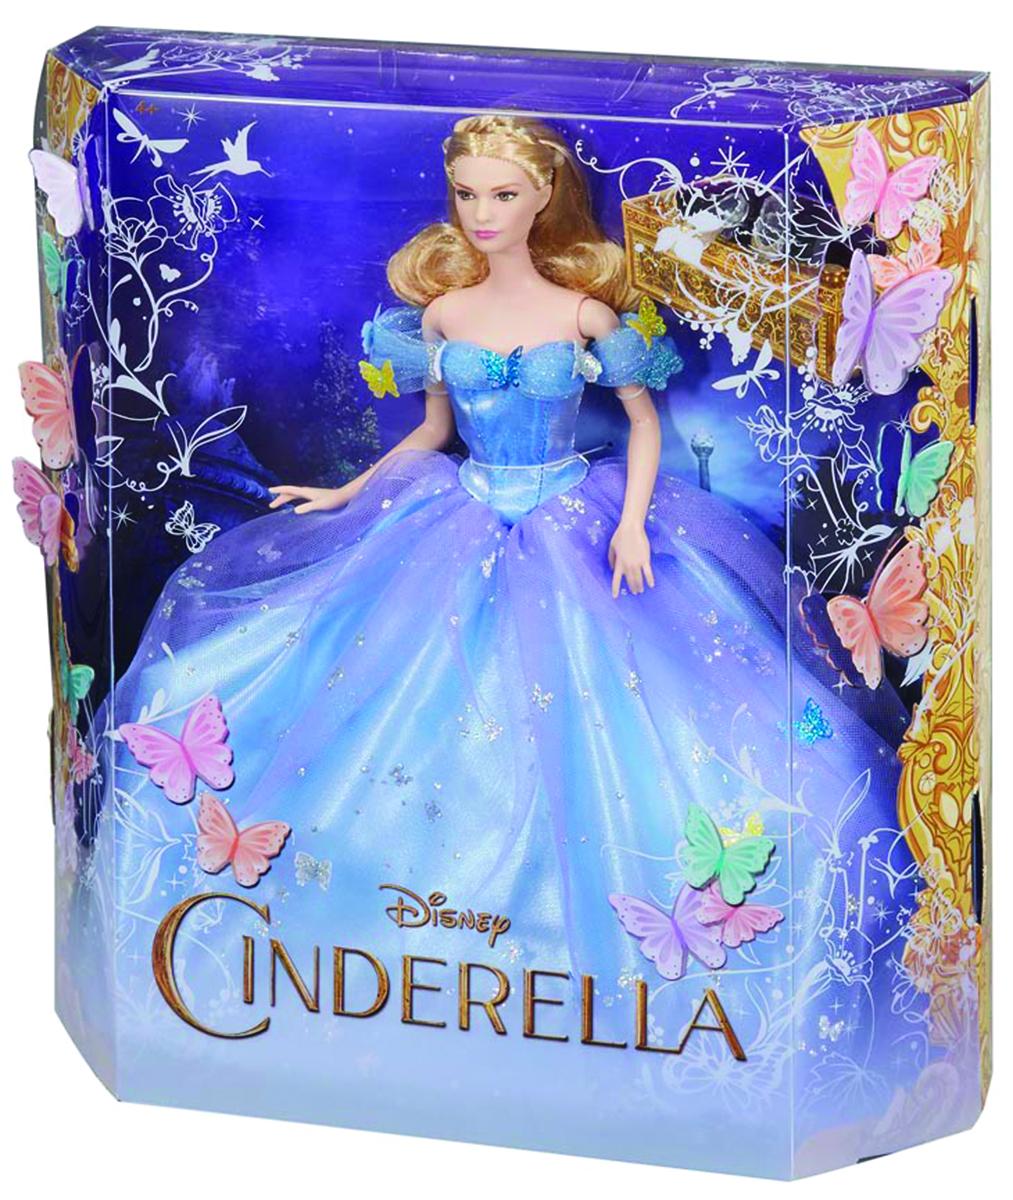 Disney Princess Royal Ball Cinderella Doll: DISNEY CINDERELLA ROYAL BALL DOLL CS